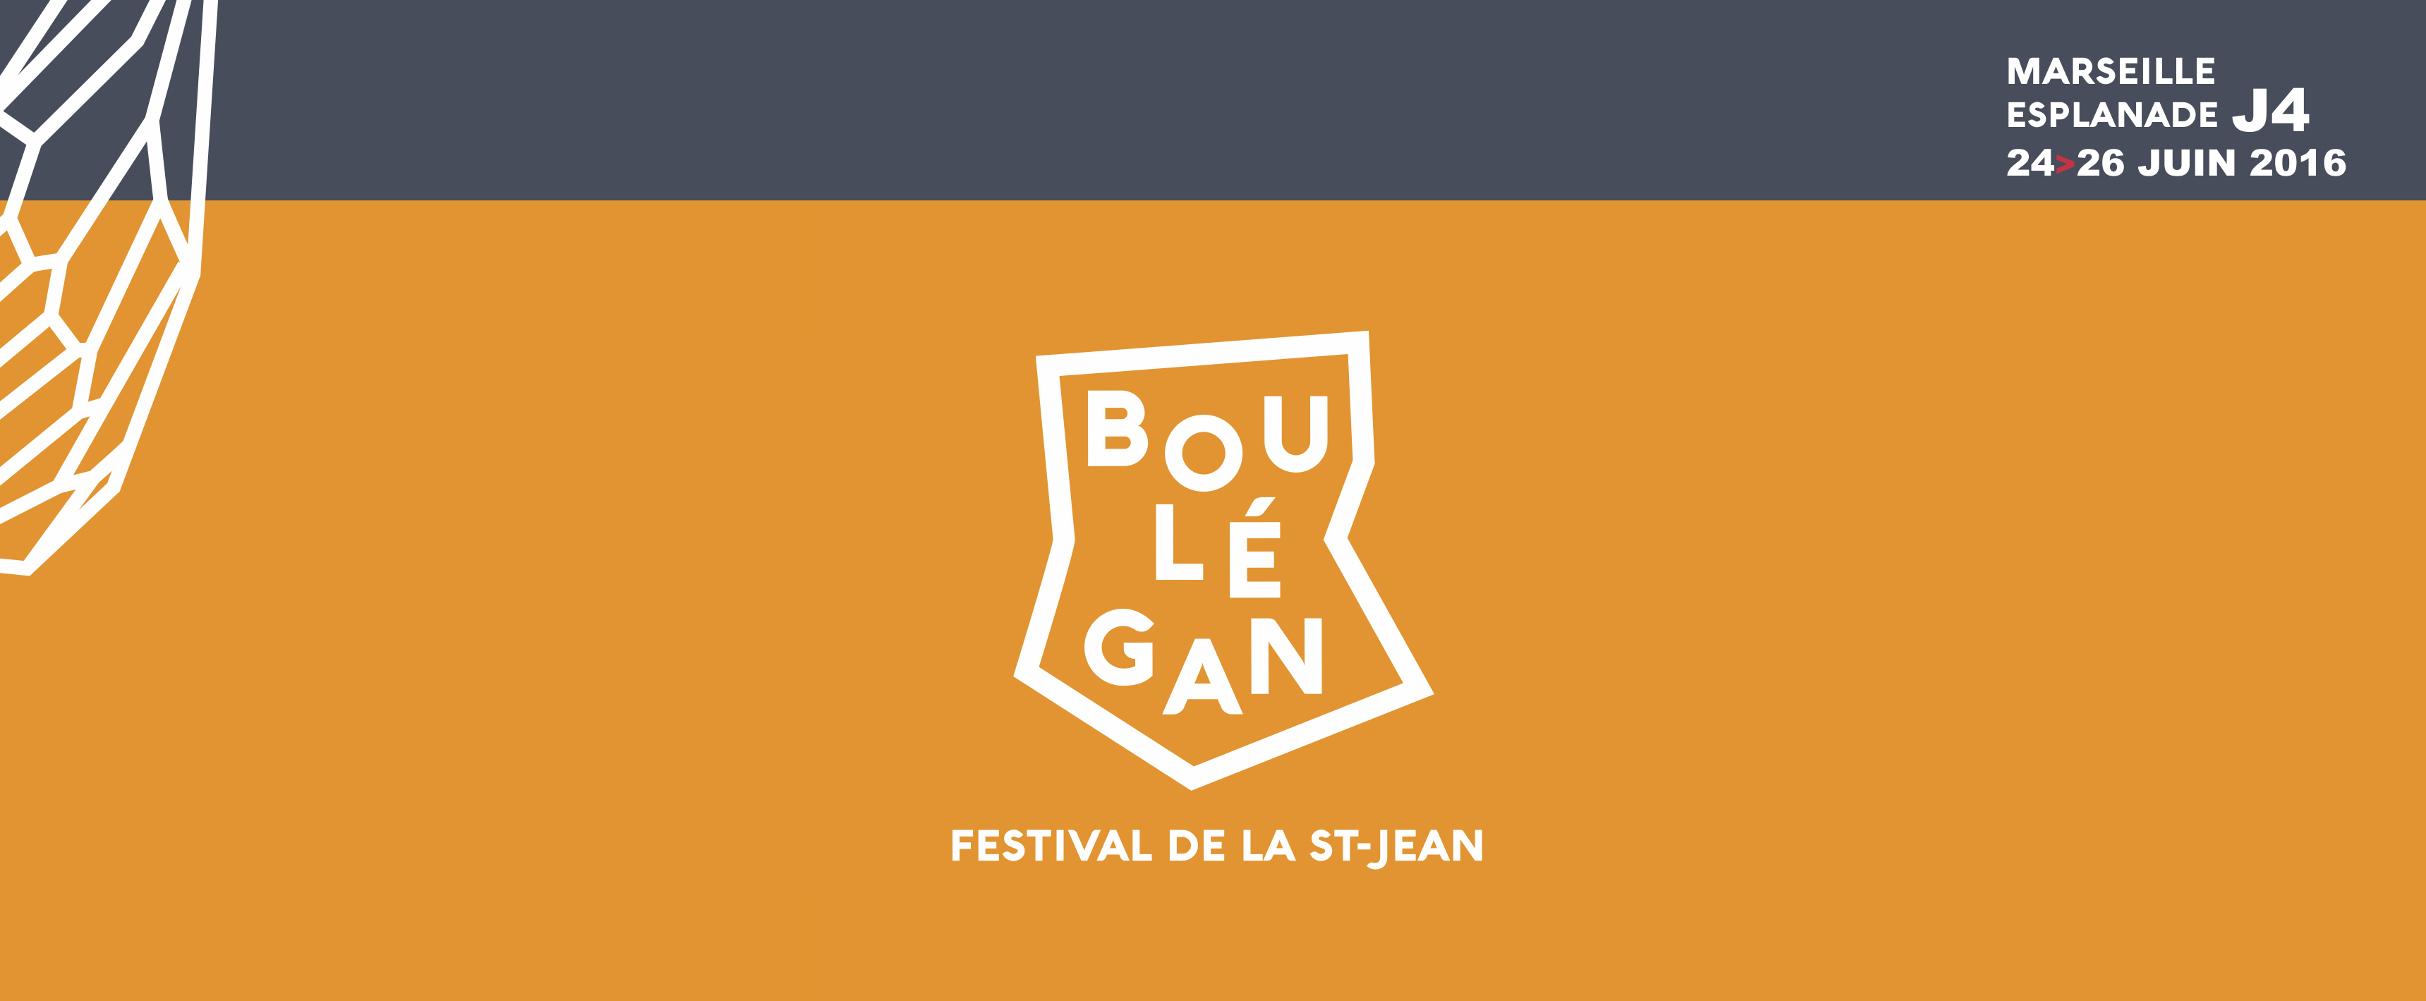 Boulegan Marseille